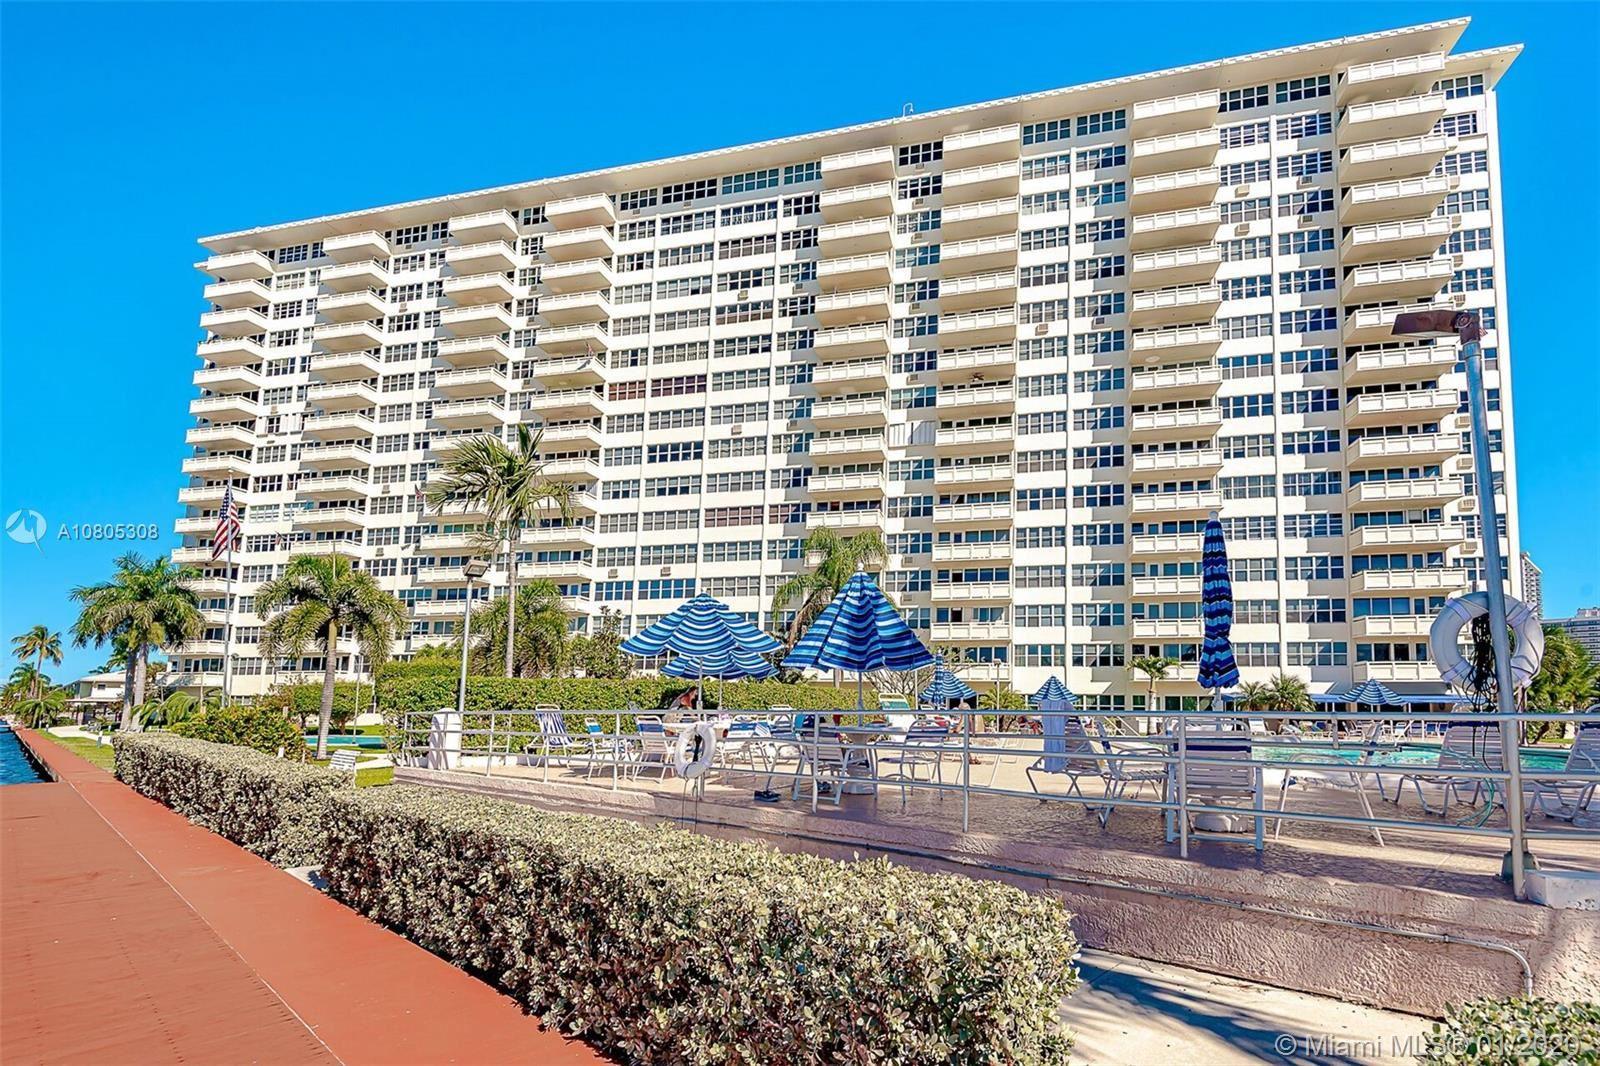 3200 NE 36th St #616, Fort Lauderdale, FL 33308 - #: A10805308